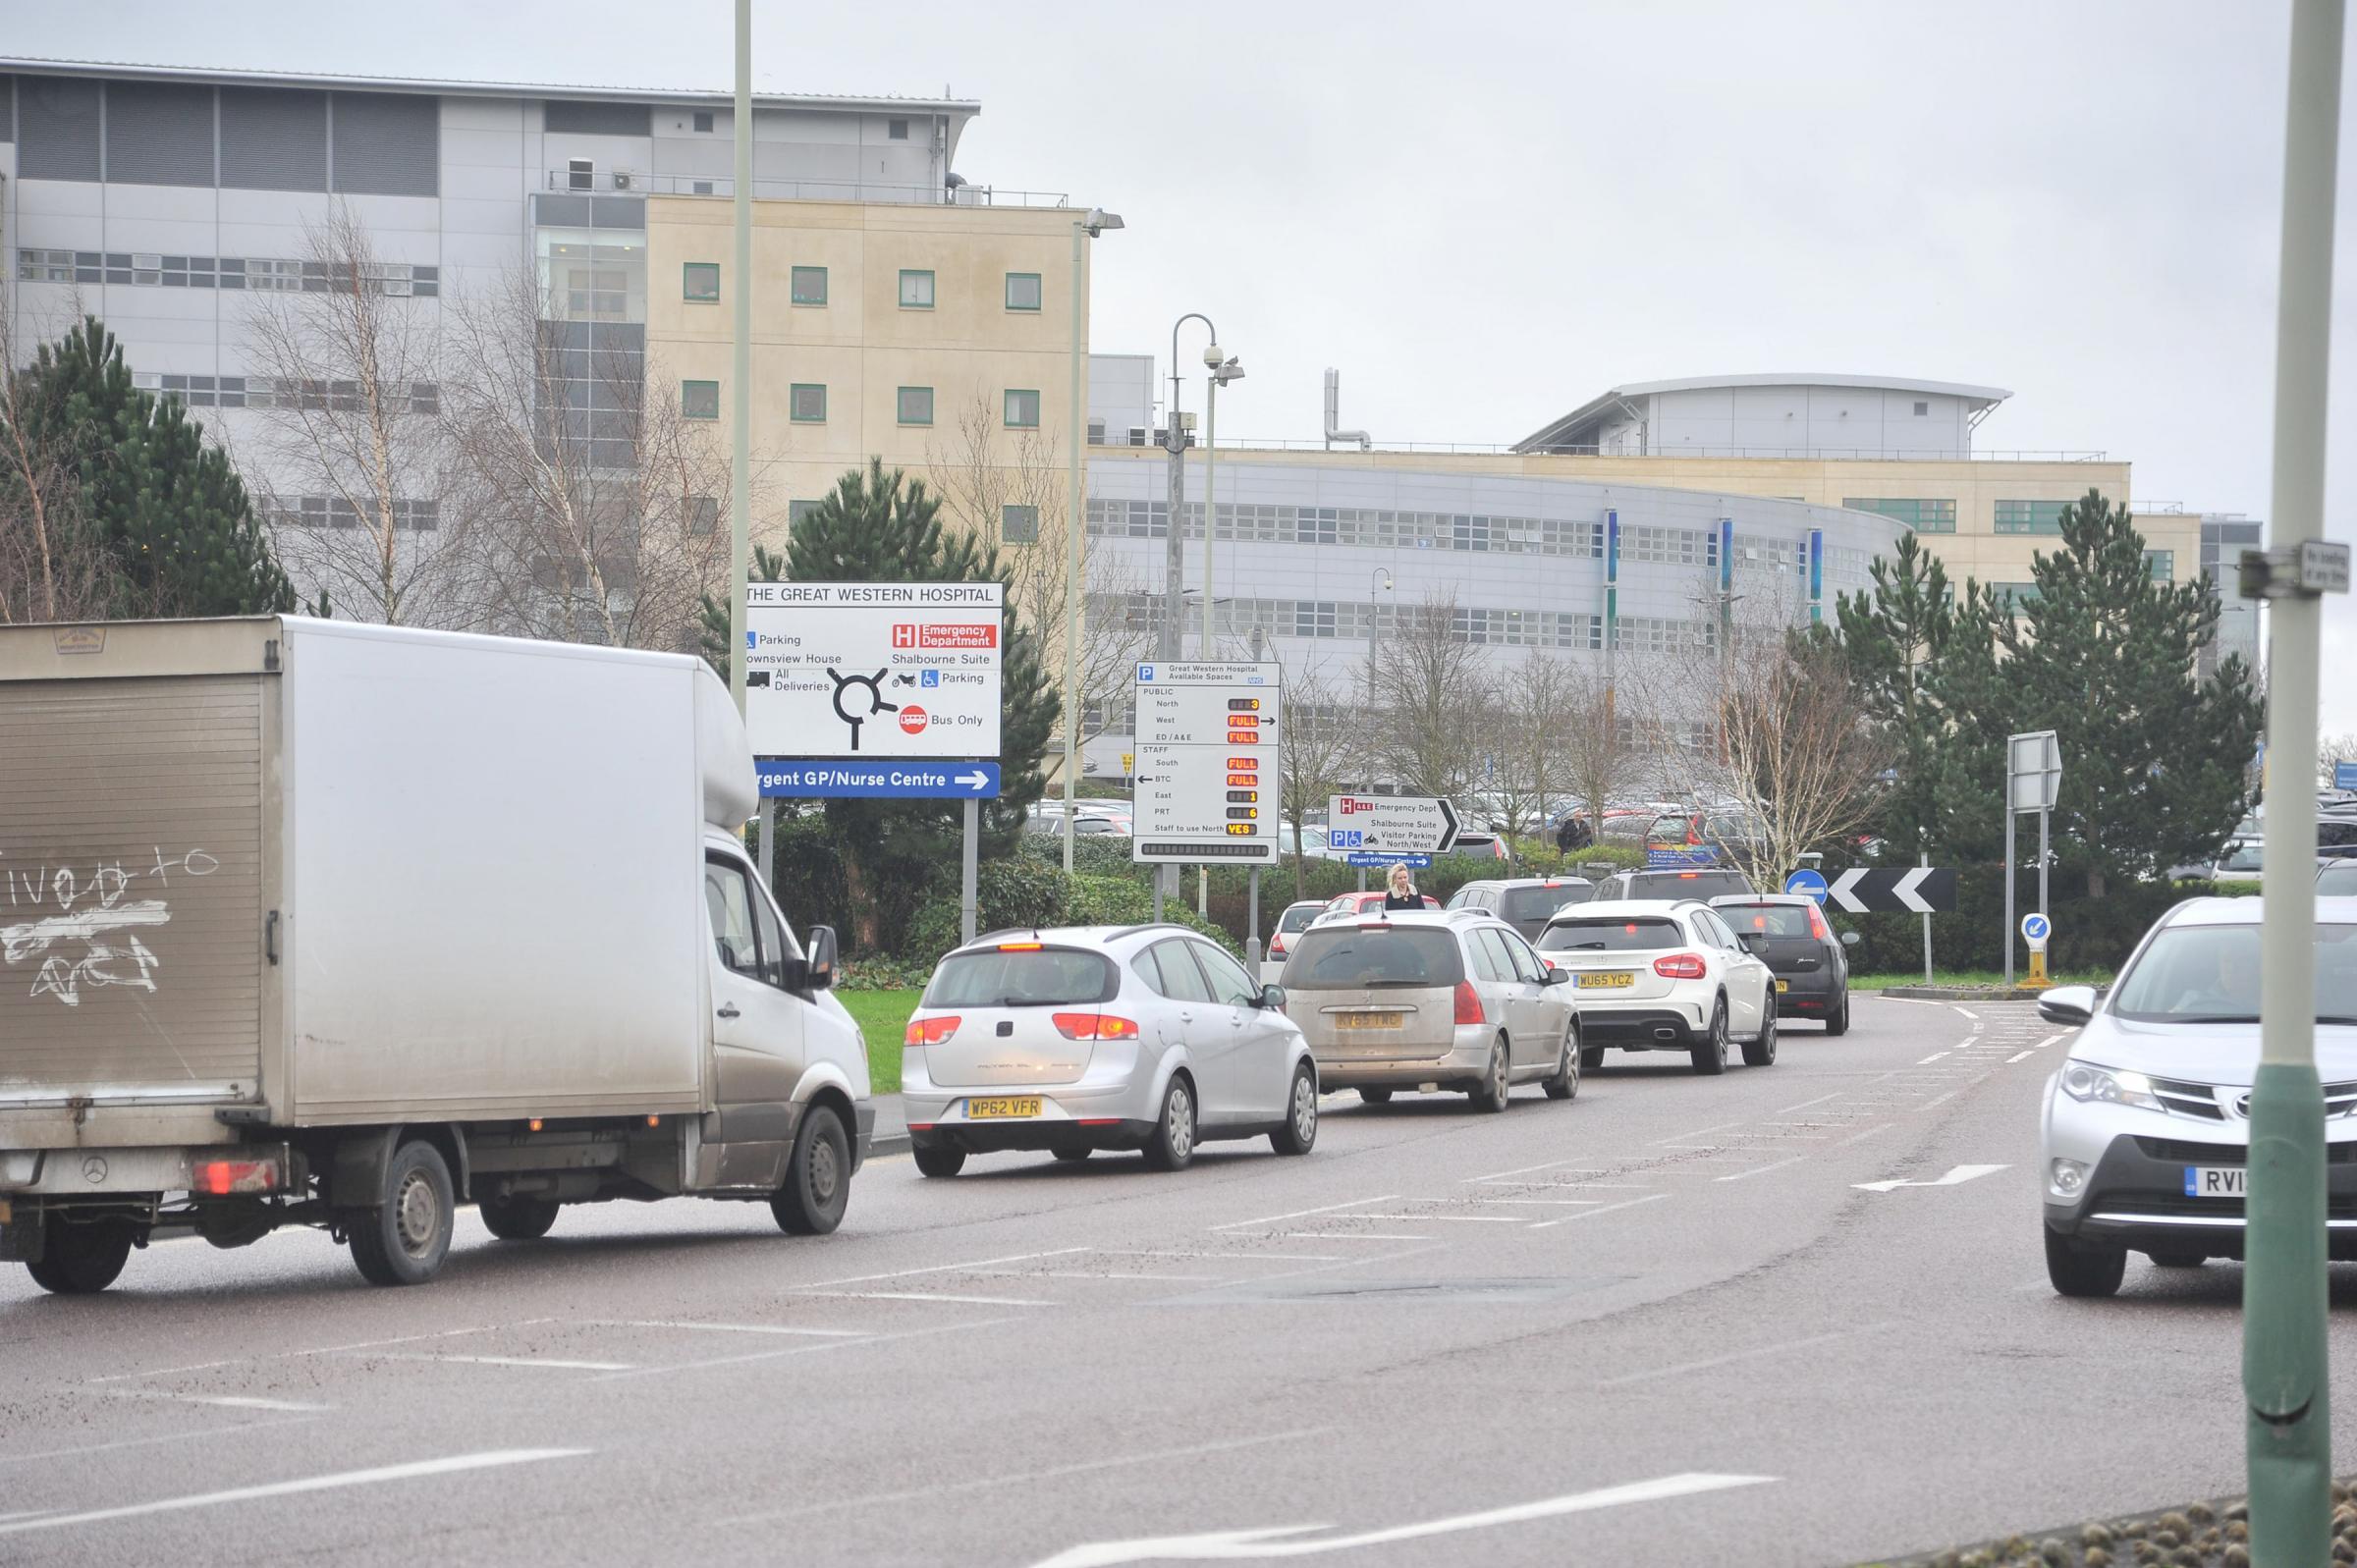 Traffic updates for Swindon on Friday morning